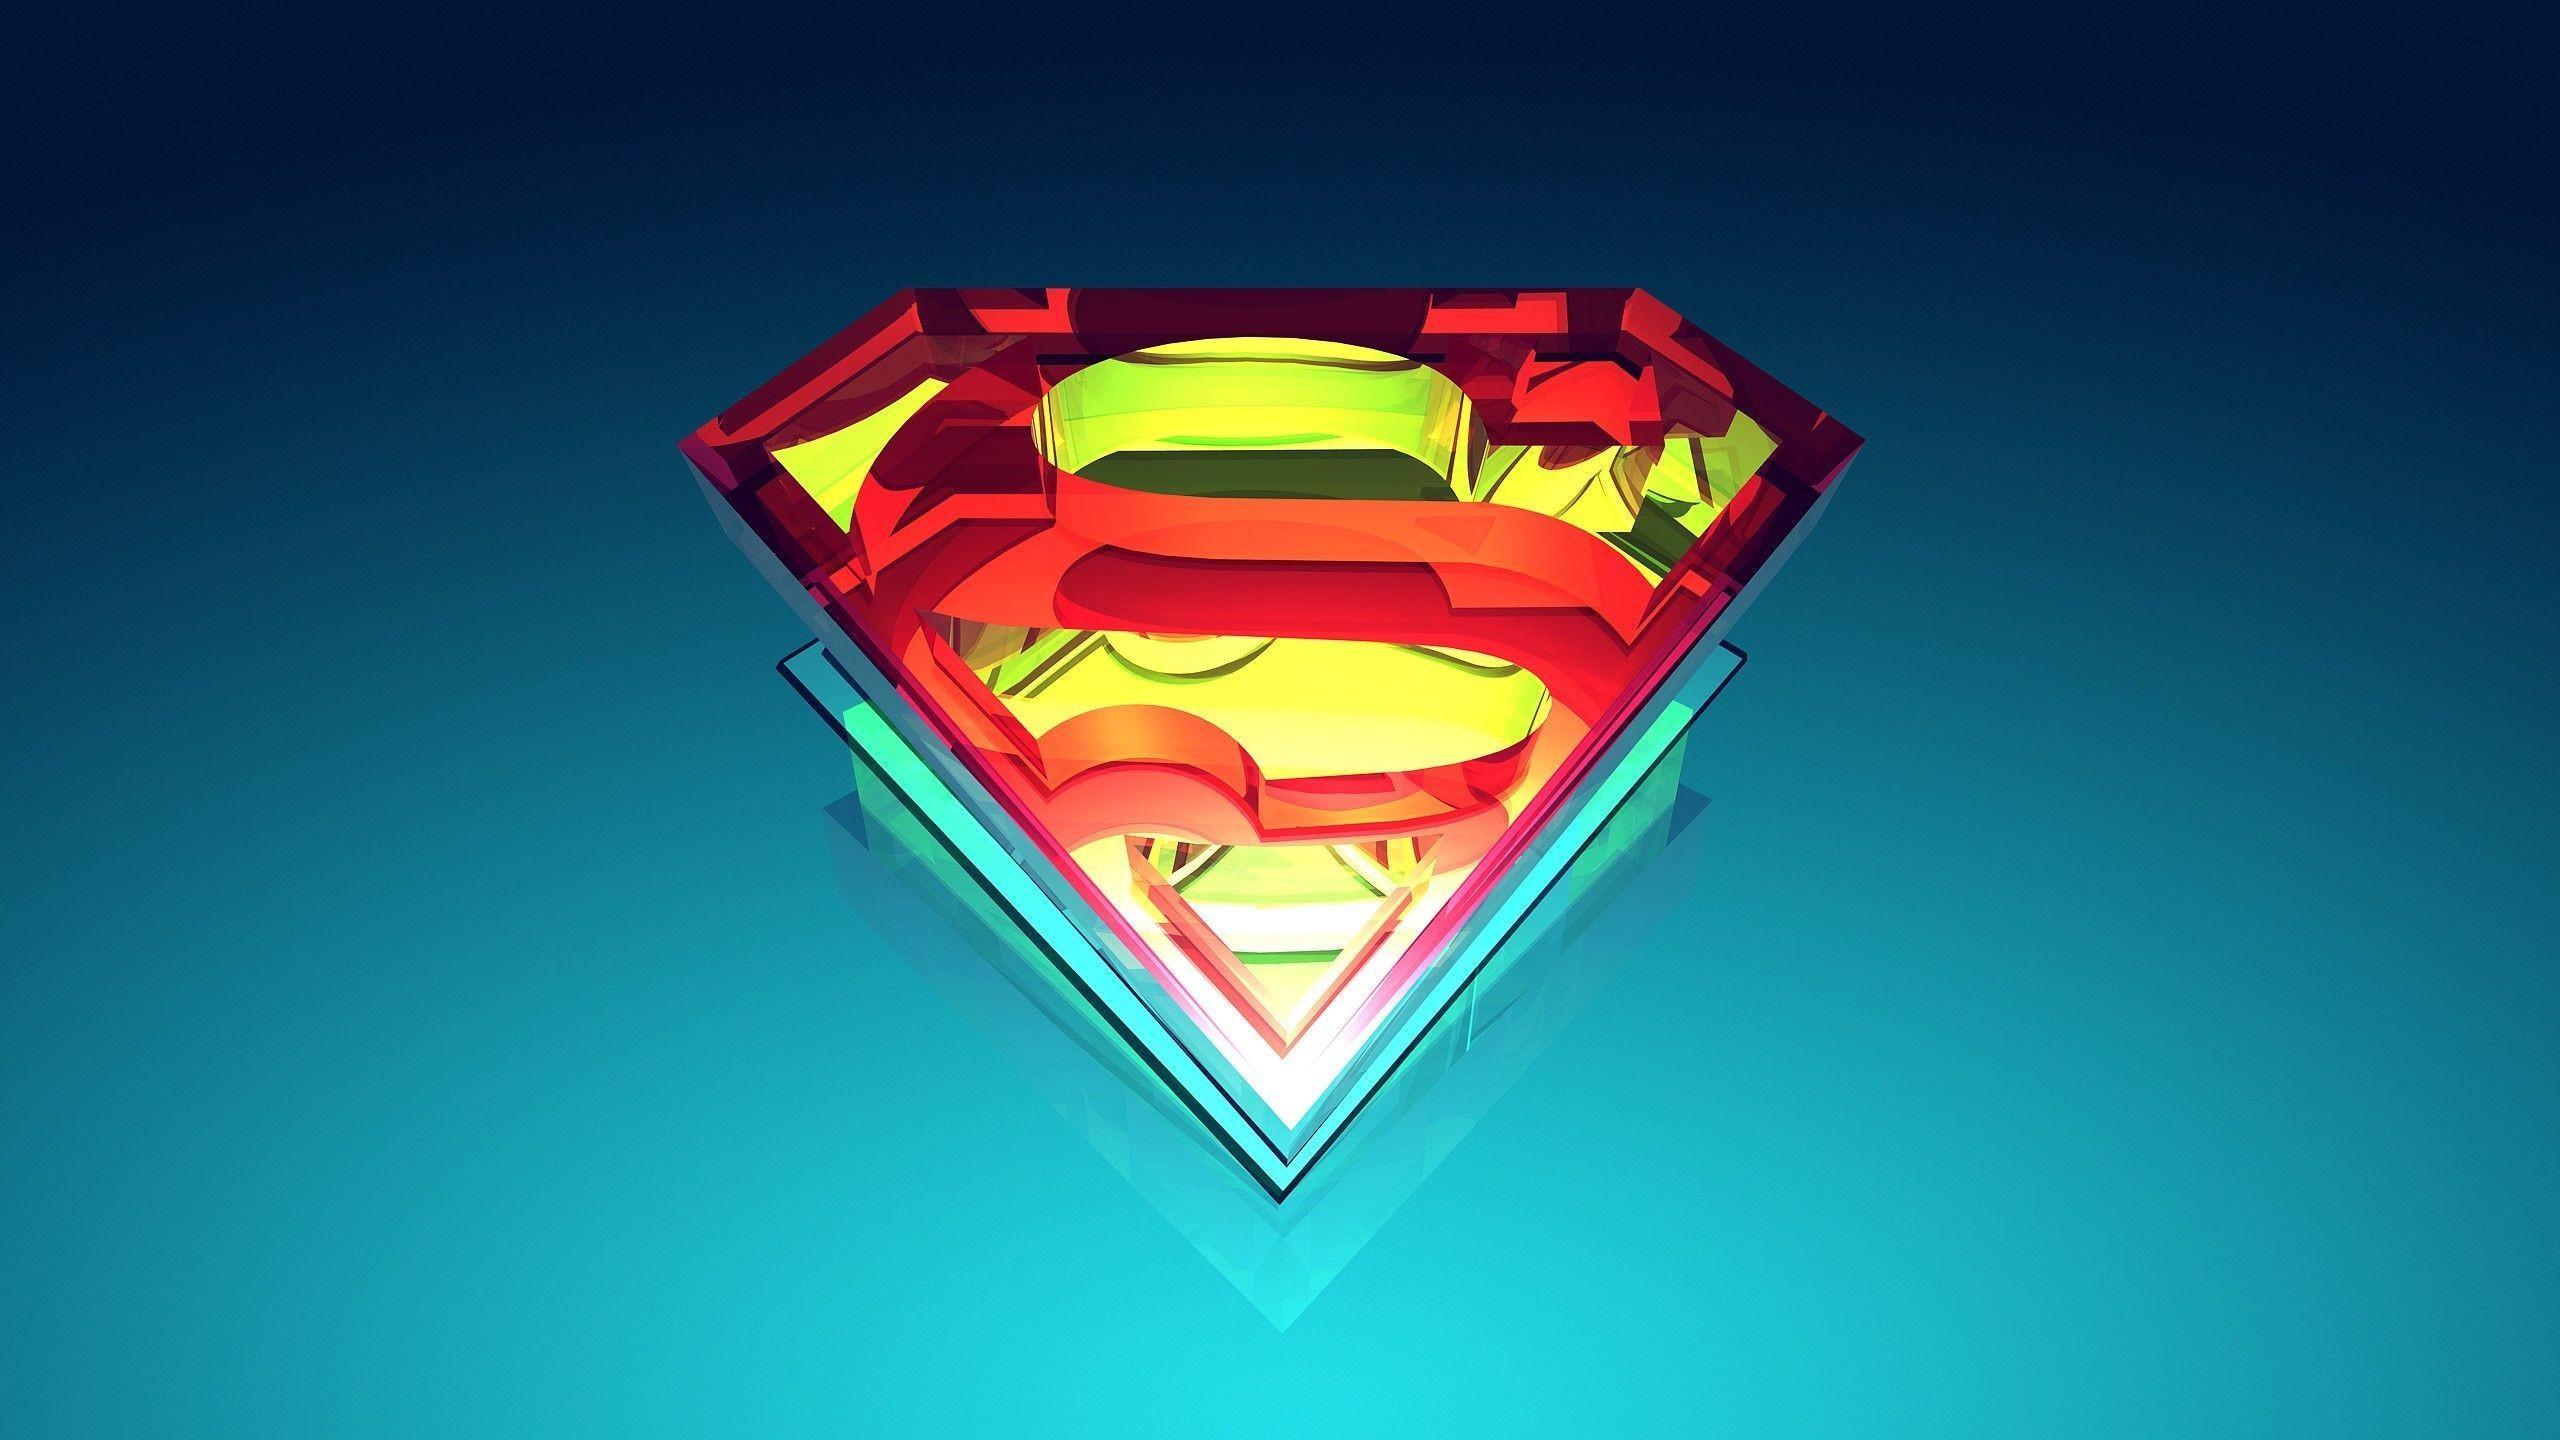 New Superman Logo Wallpapers Wallpaper 1600×1200 Superman Logo Wallpaper |  Adorable Wallpapers